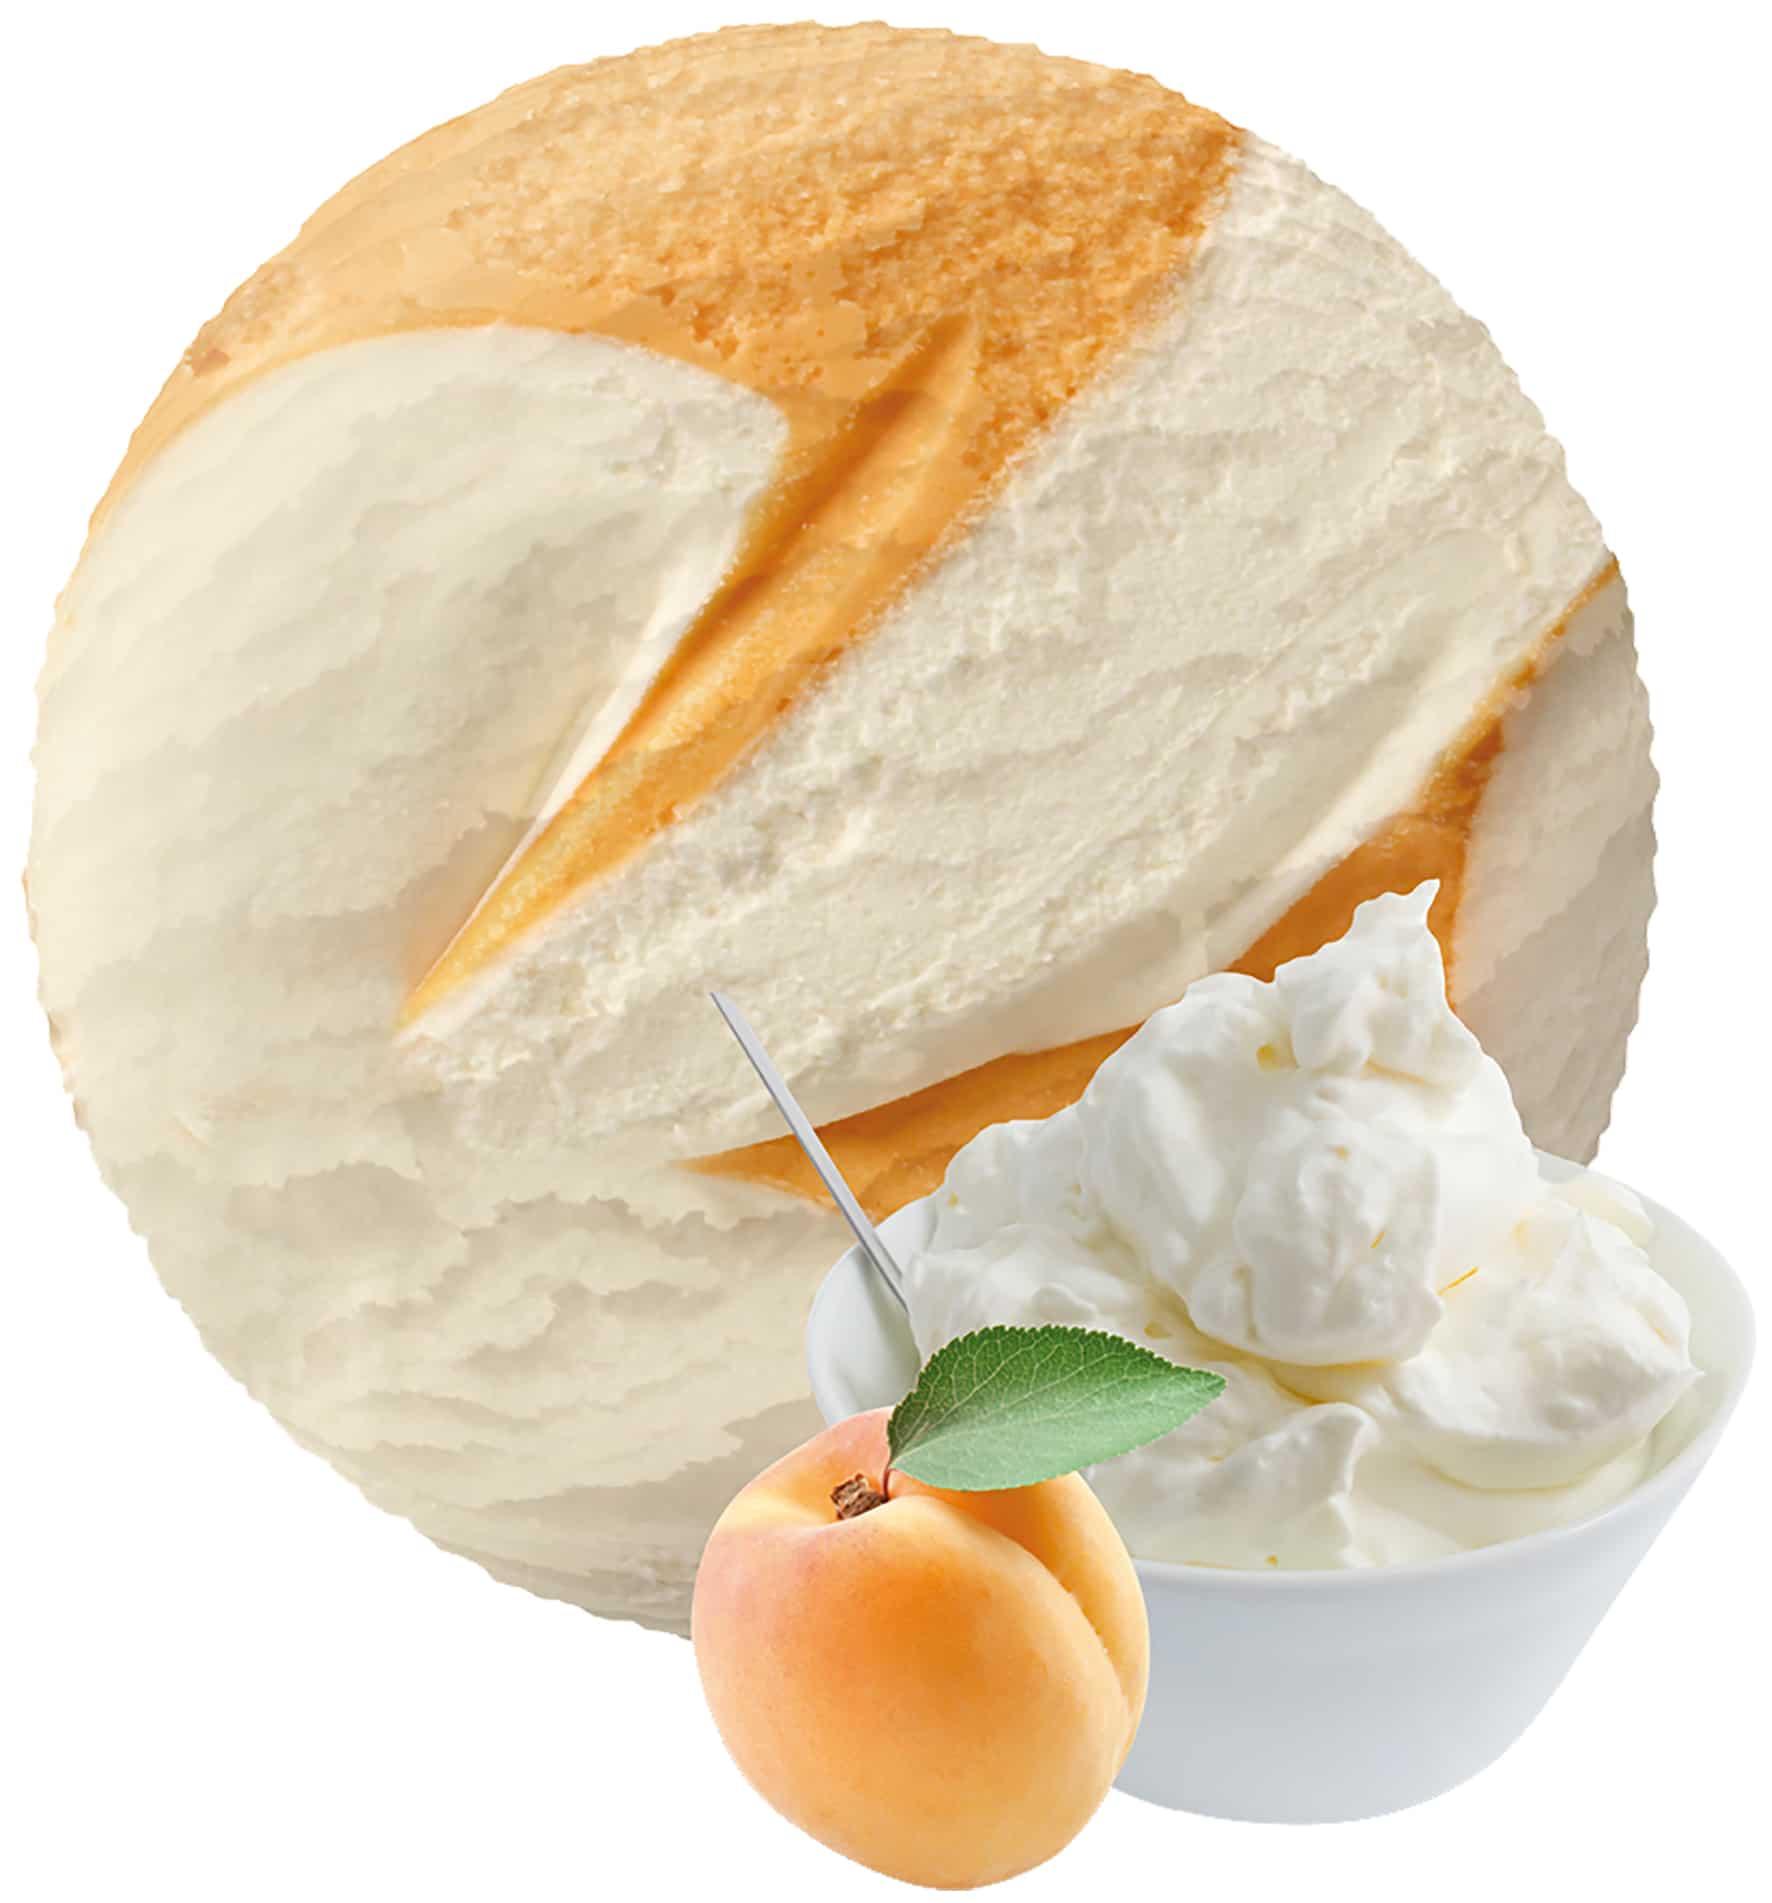 30250168-1_roomijs_mascaprone-abrikoos